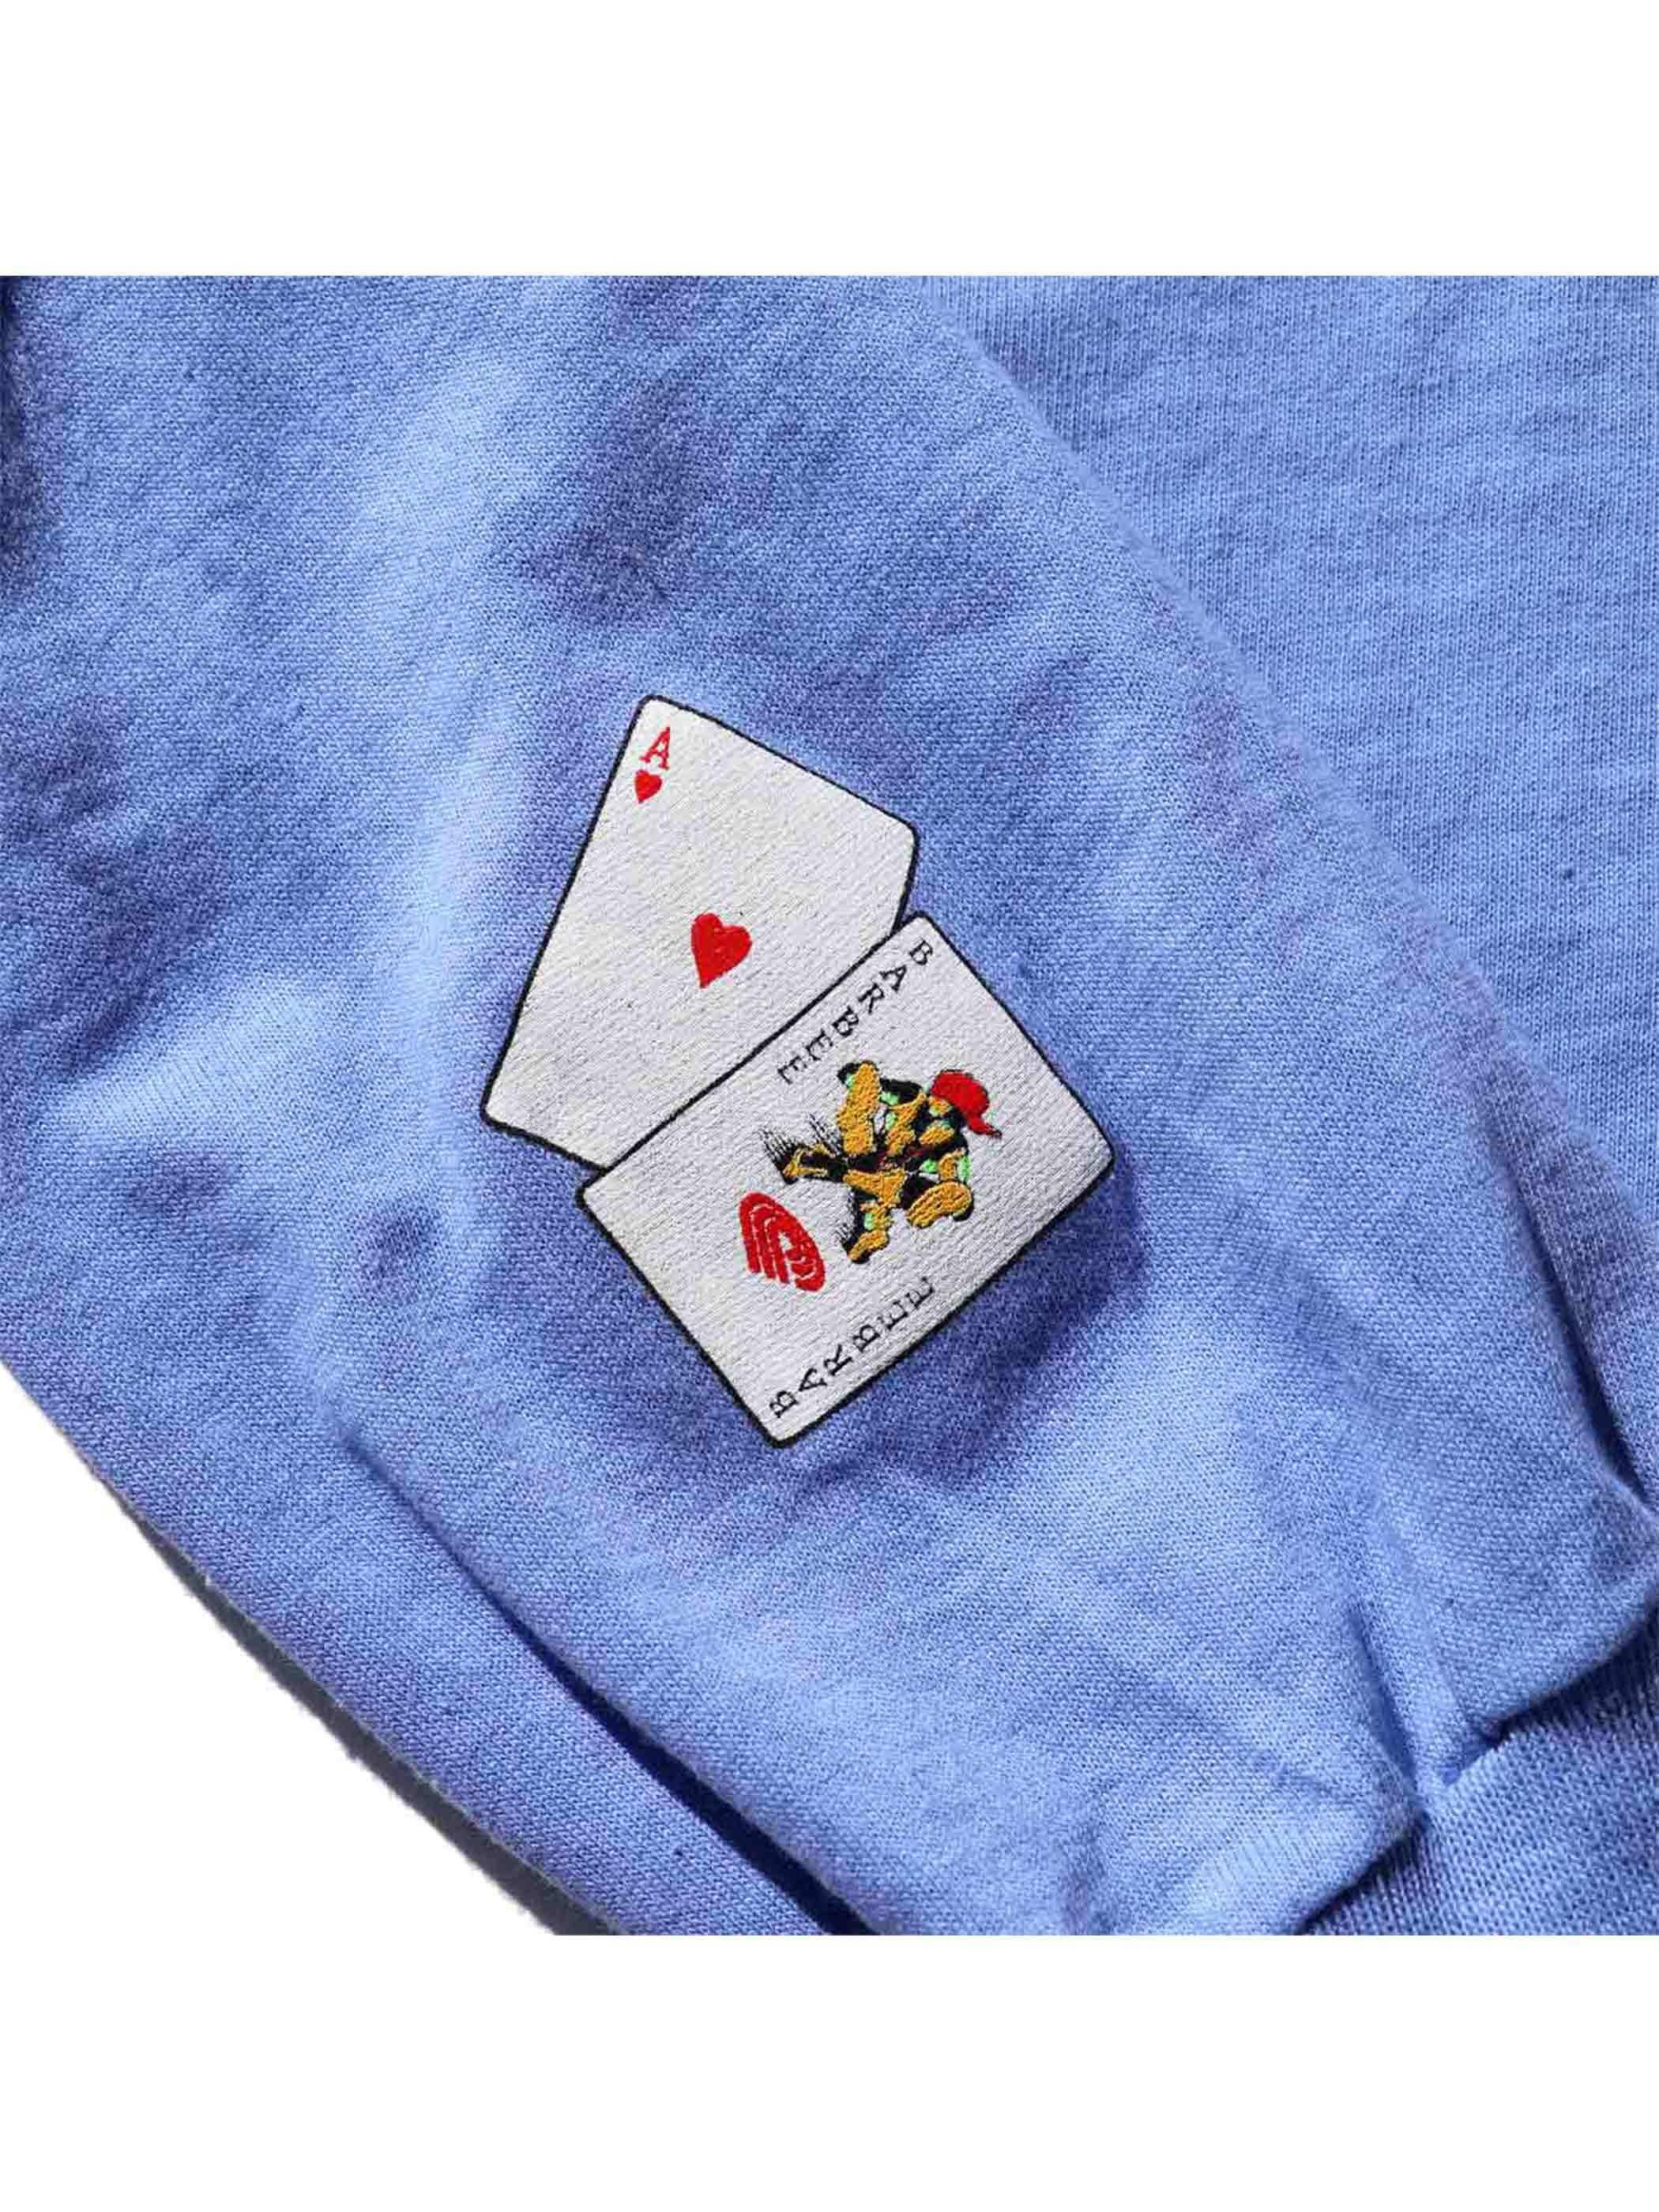 "90's POWELL PERALTA ""RAY BARBEE RAG DOLL"" USA製 ロングスリーブTシャツ [M]"